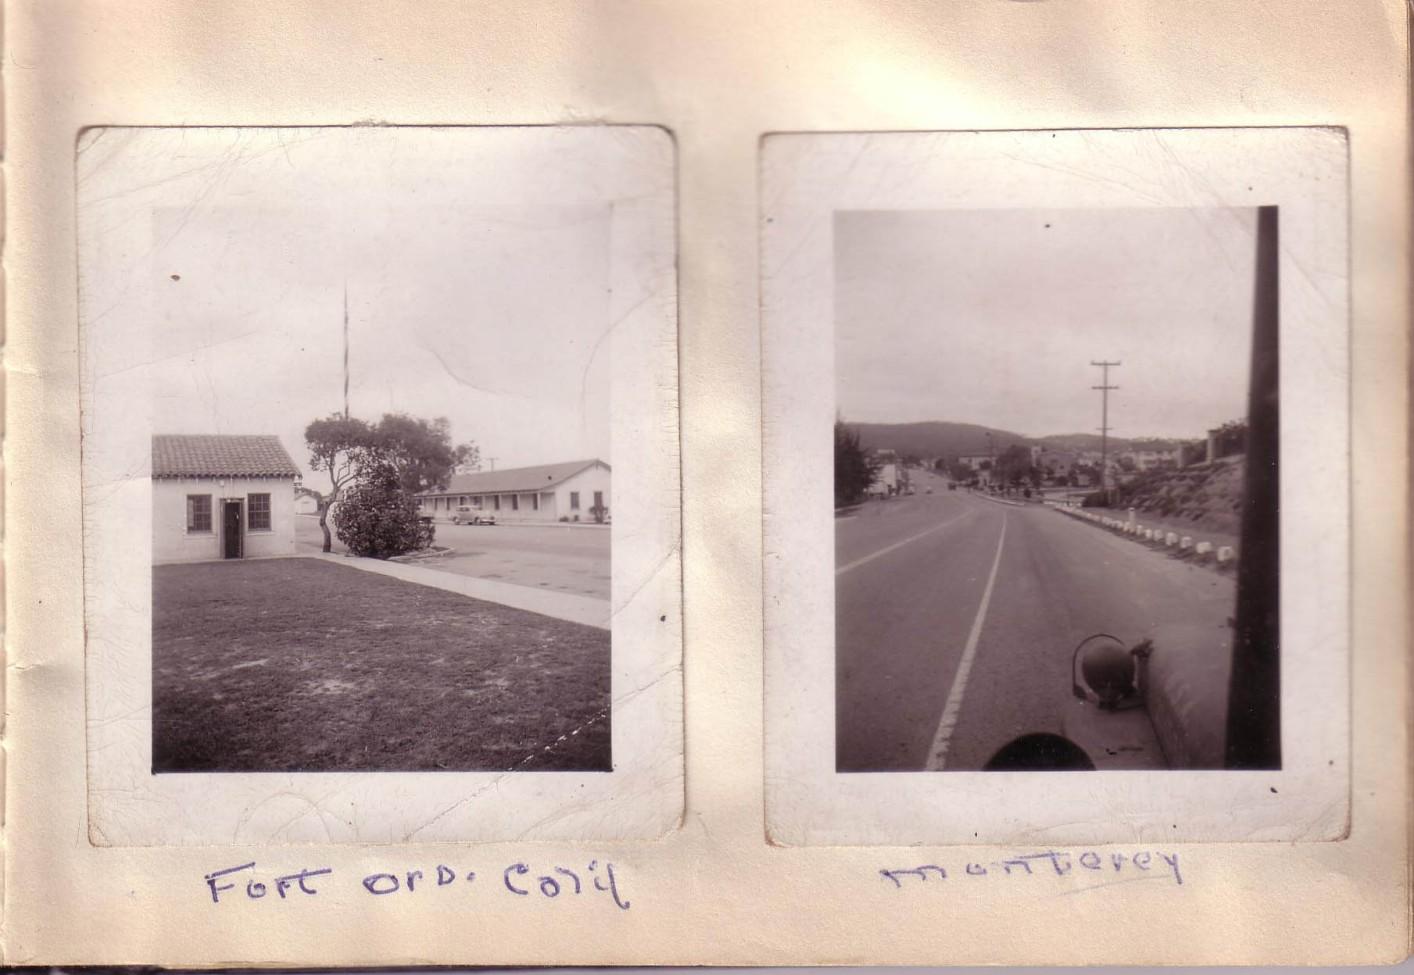 Arthur and Elizabeth Huston Vacation Album, ca. 1947 Page 5; Fort Ord Calif,Monterey